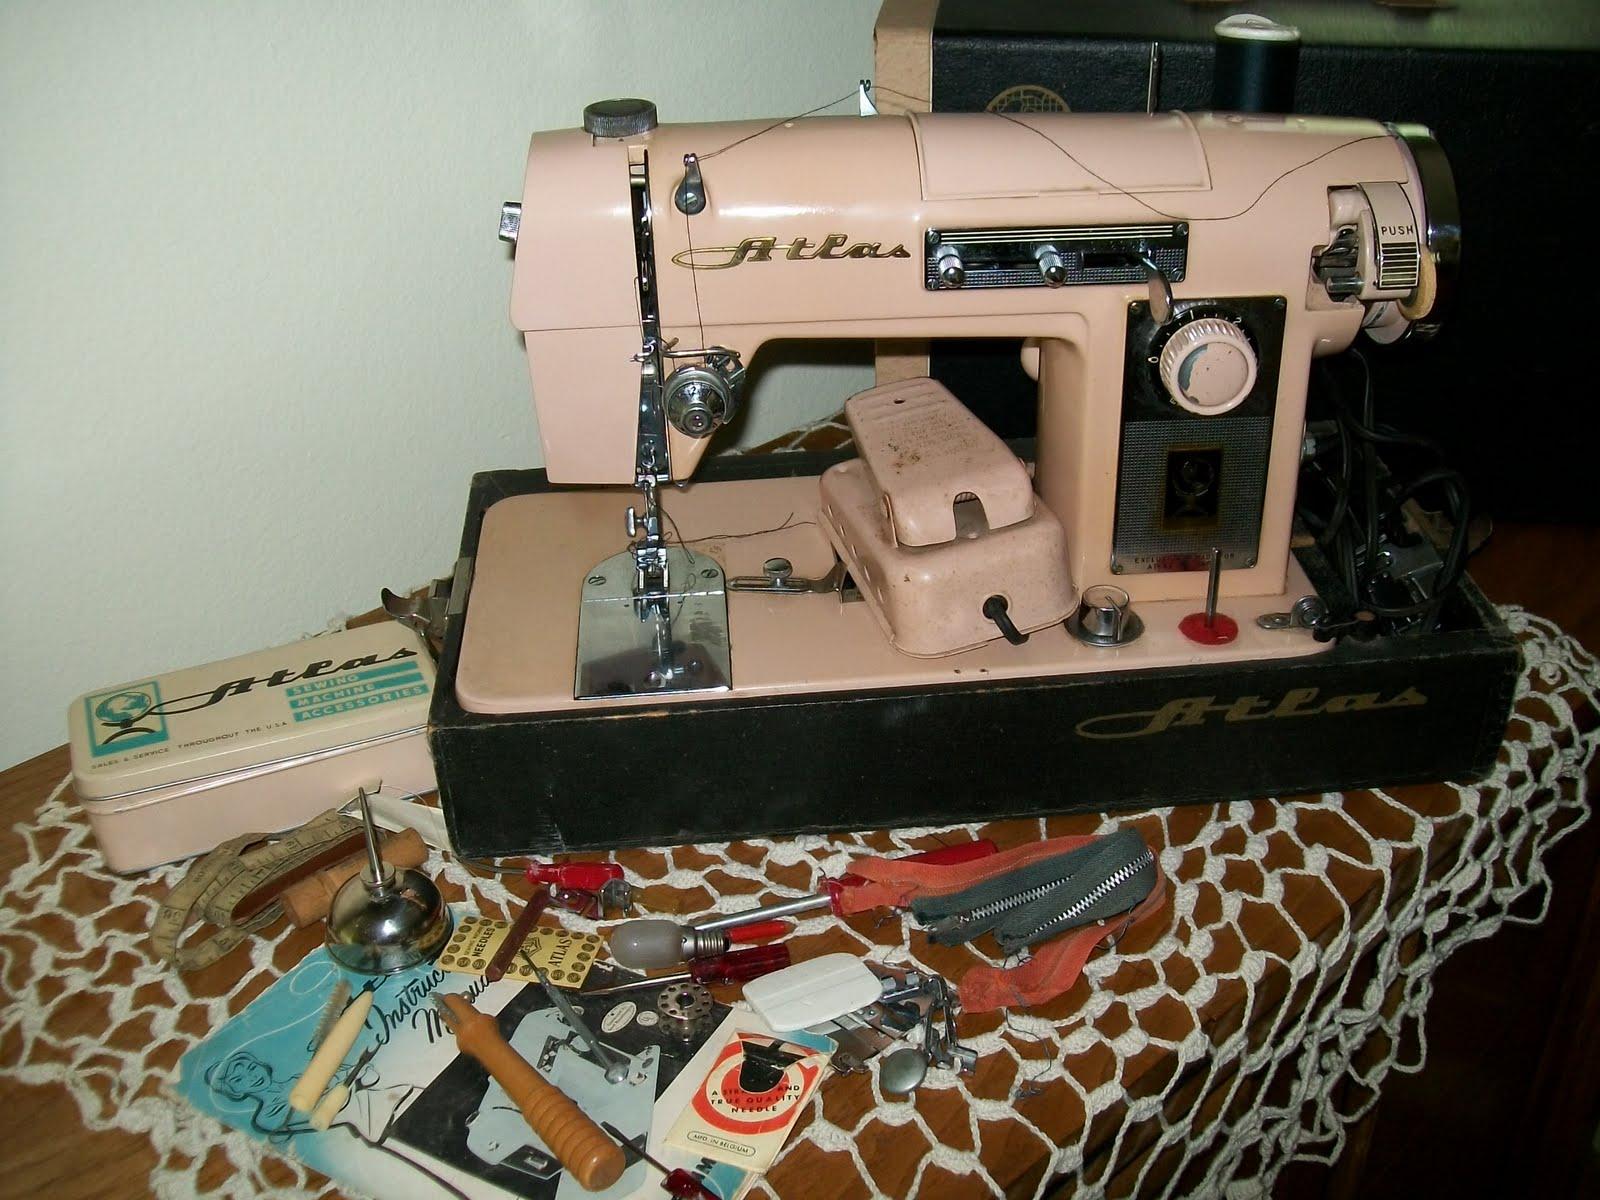 atlas sewing machine manual